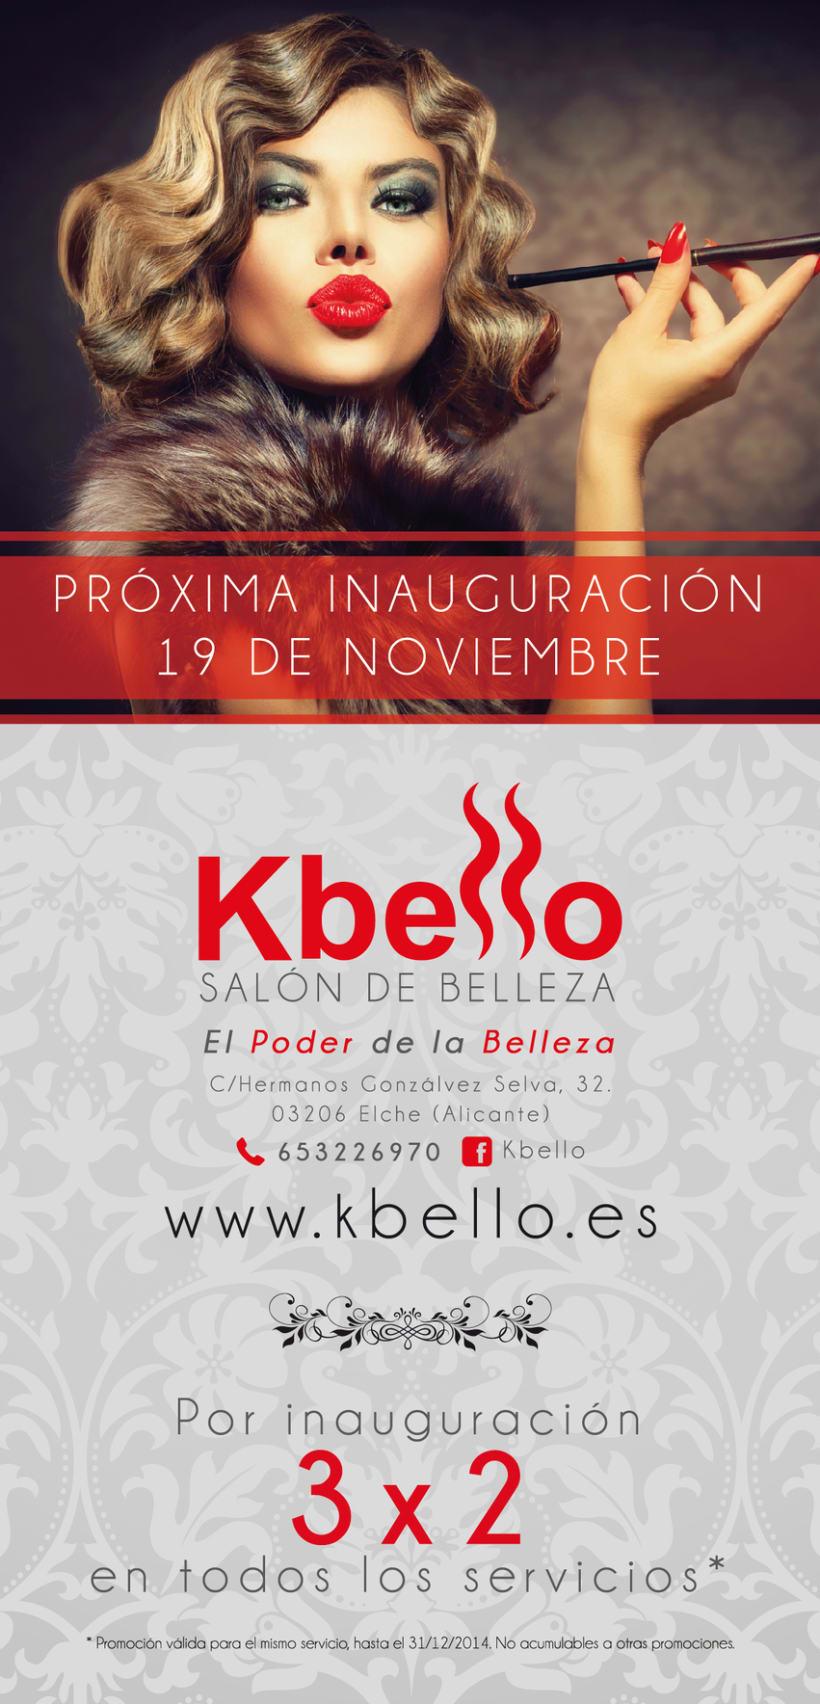 Kbello 2